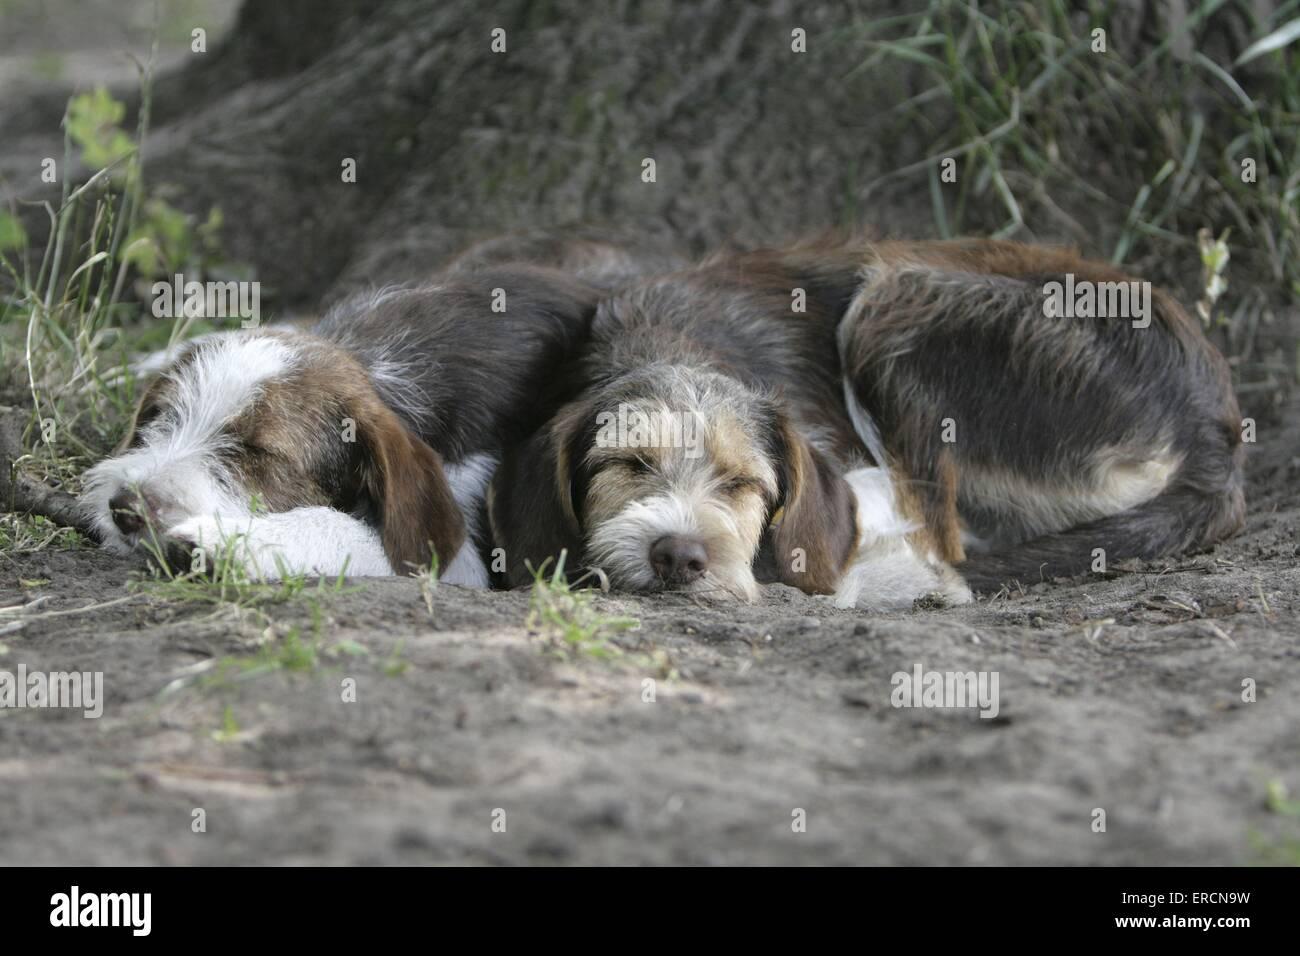 lying dogs - Stock Image